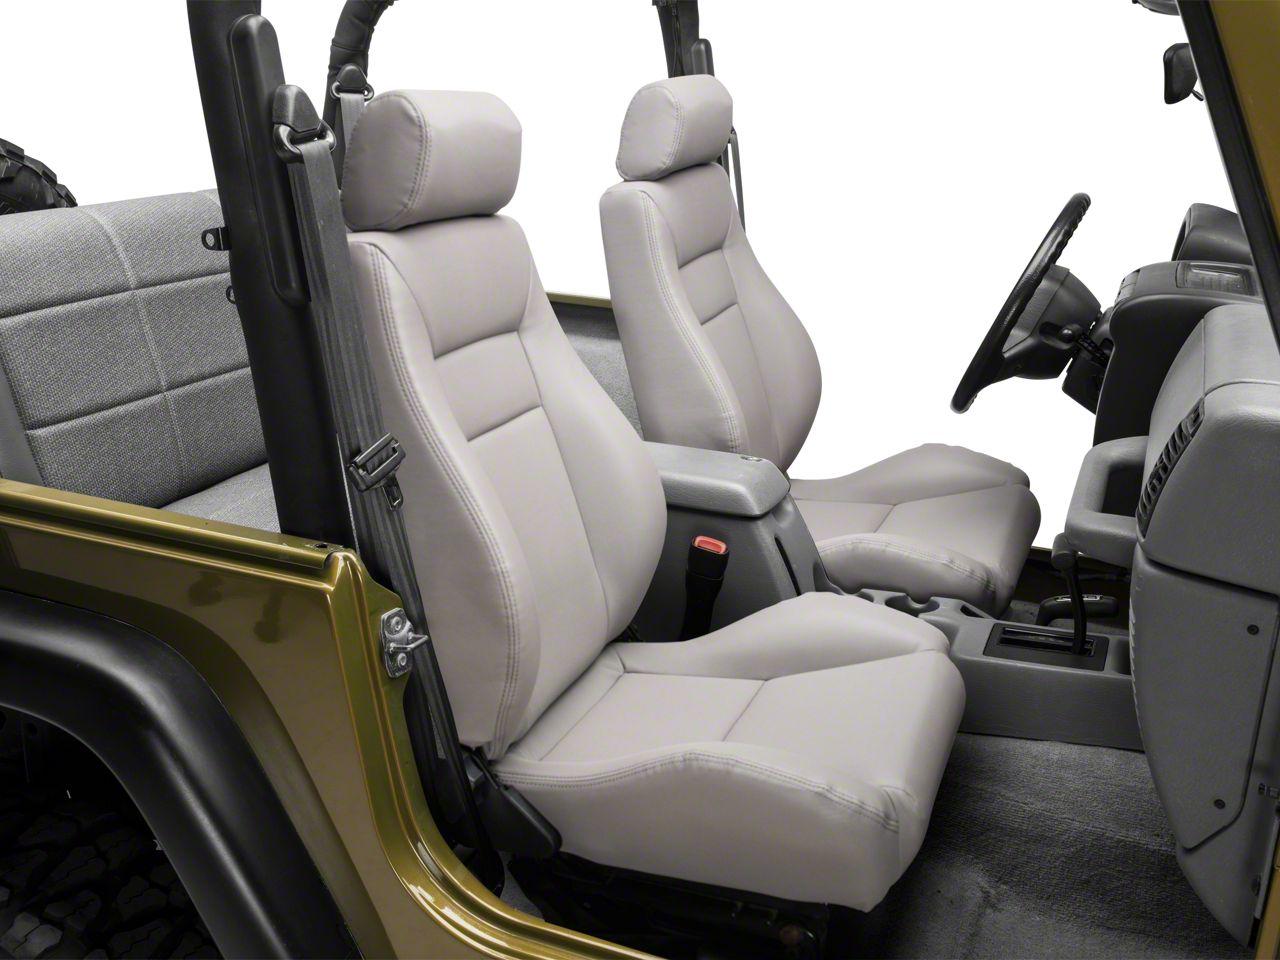 Smittybilt Seat - Front - Contour Sport Bucket w/ Recliner - Gray Denim (87-18 Jeep Wrangler YJ, TJ, JK & JL)